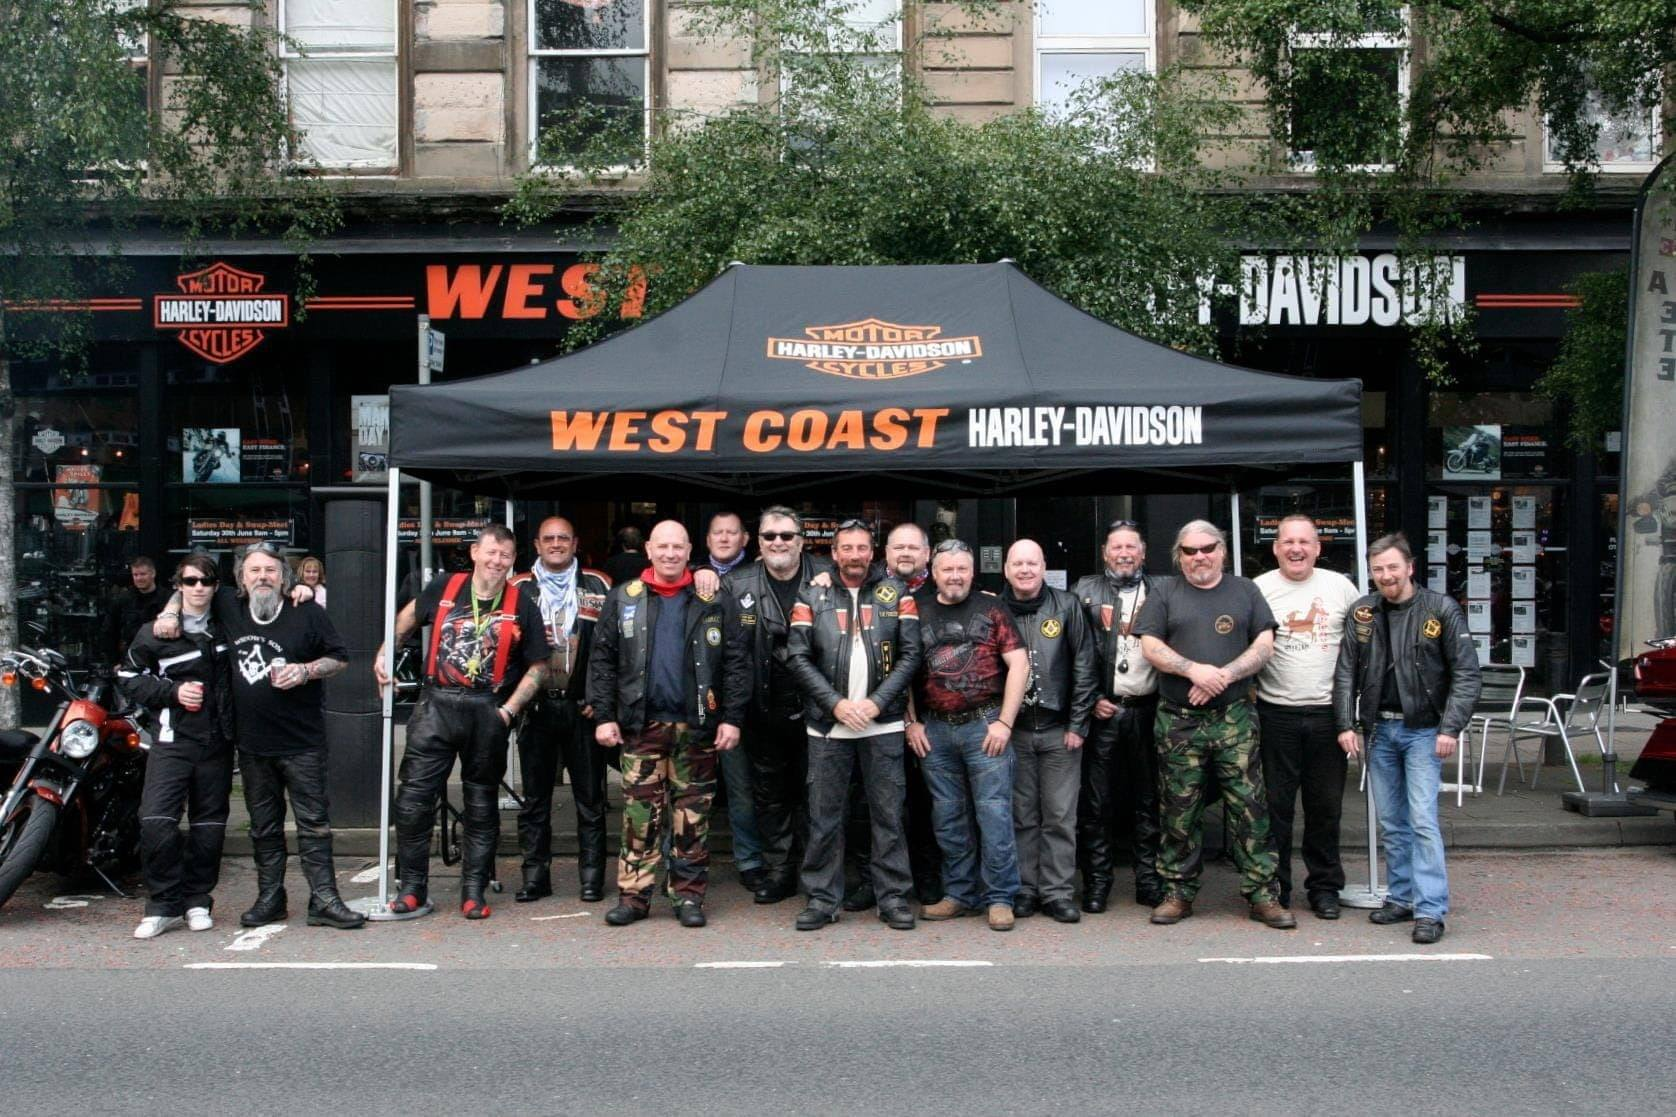 <p>Tent – Classic – Harley Davidson</p> <p>West Coast, Harley-Davidson</p>